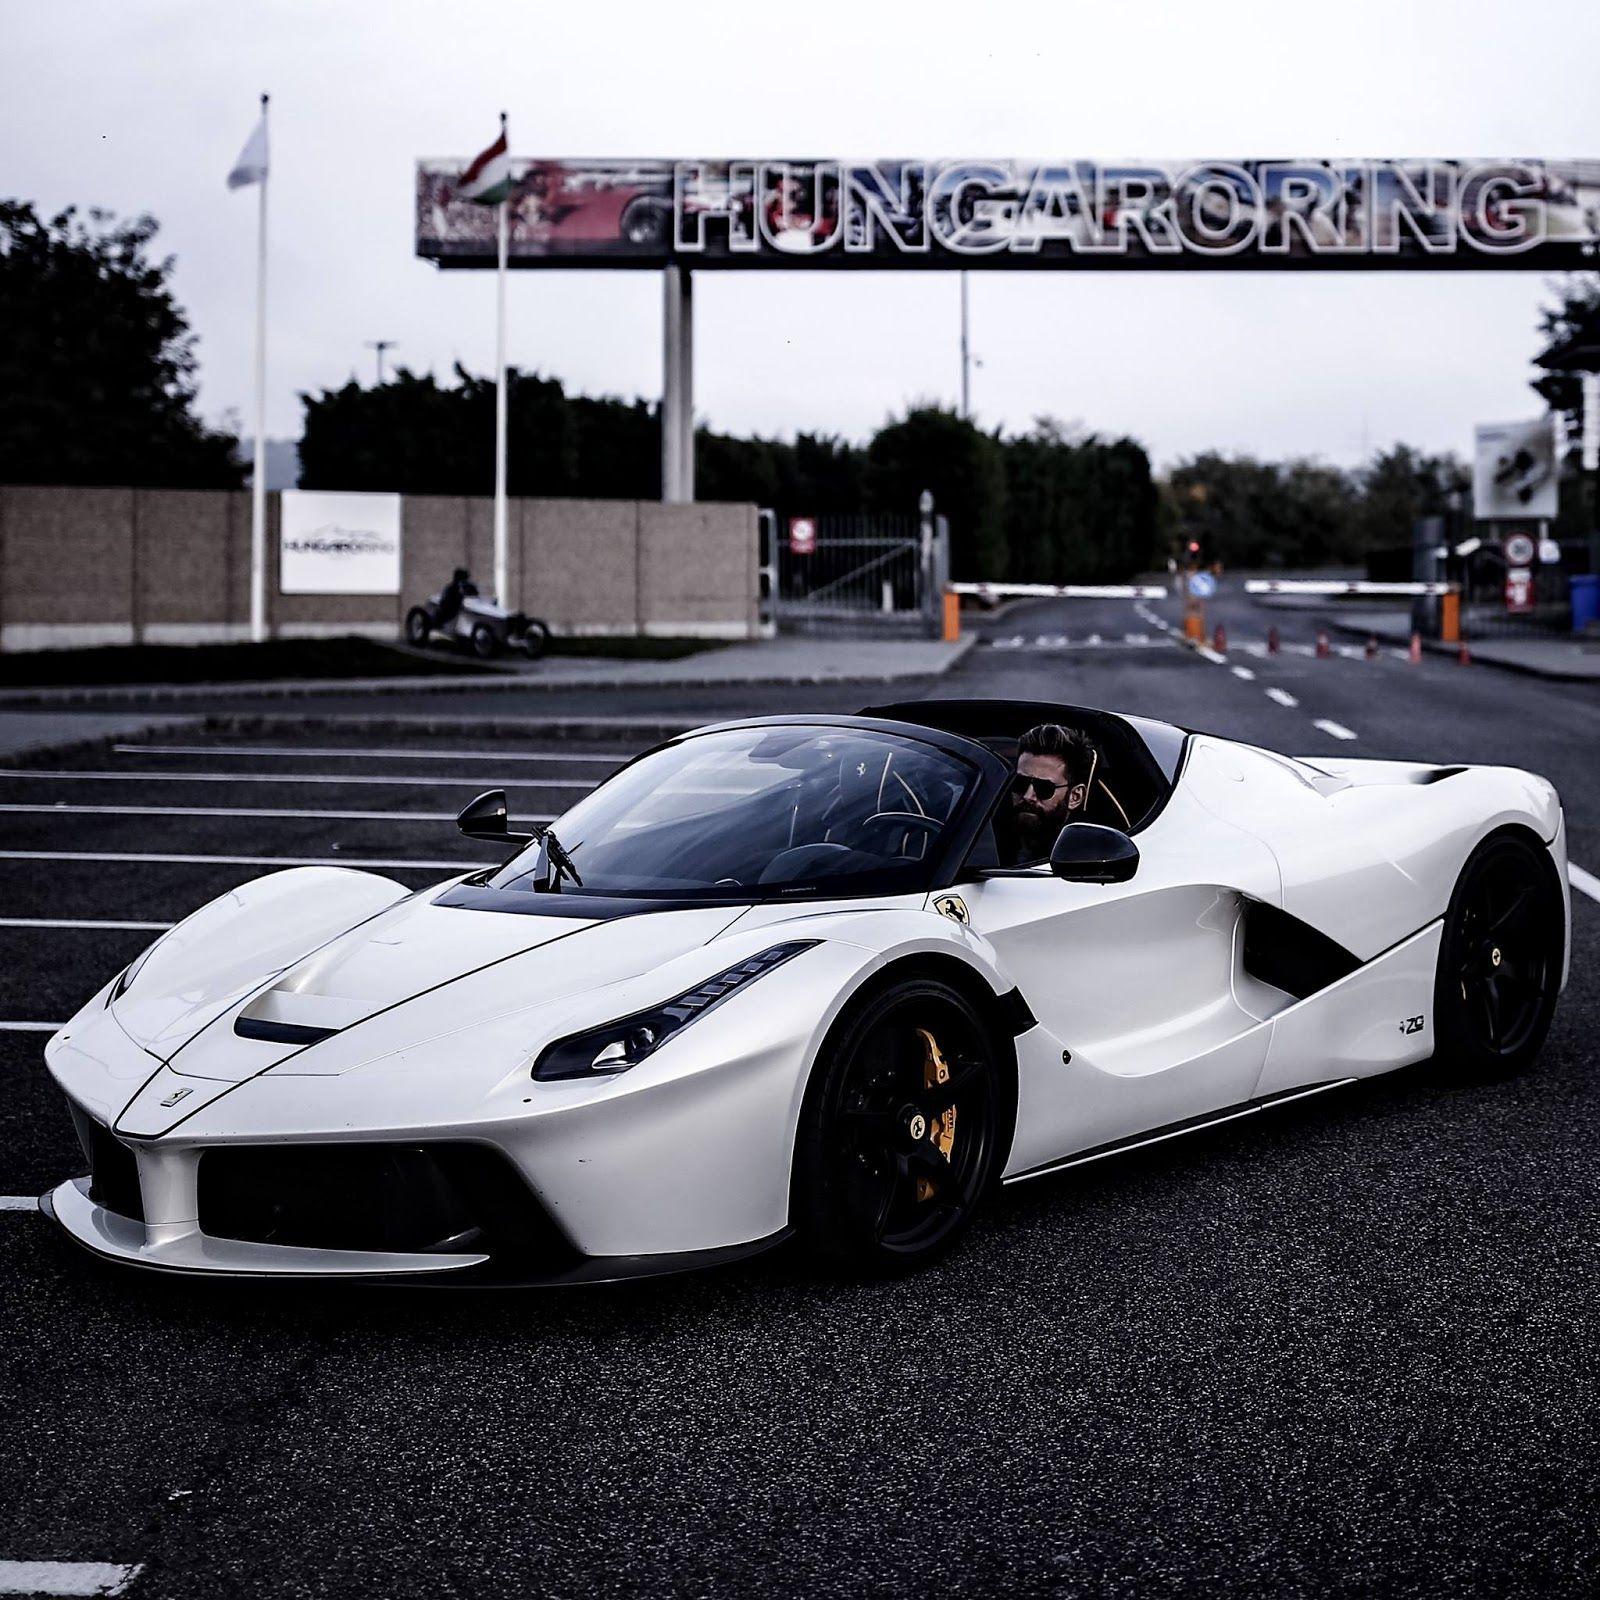 Josh Cartu S White Laferrari Aperta Is Simply Breathtaking Carscoops Ferrari Ferrari Laferrari Josh Cartu